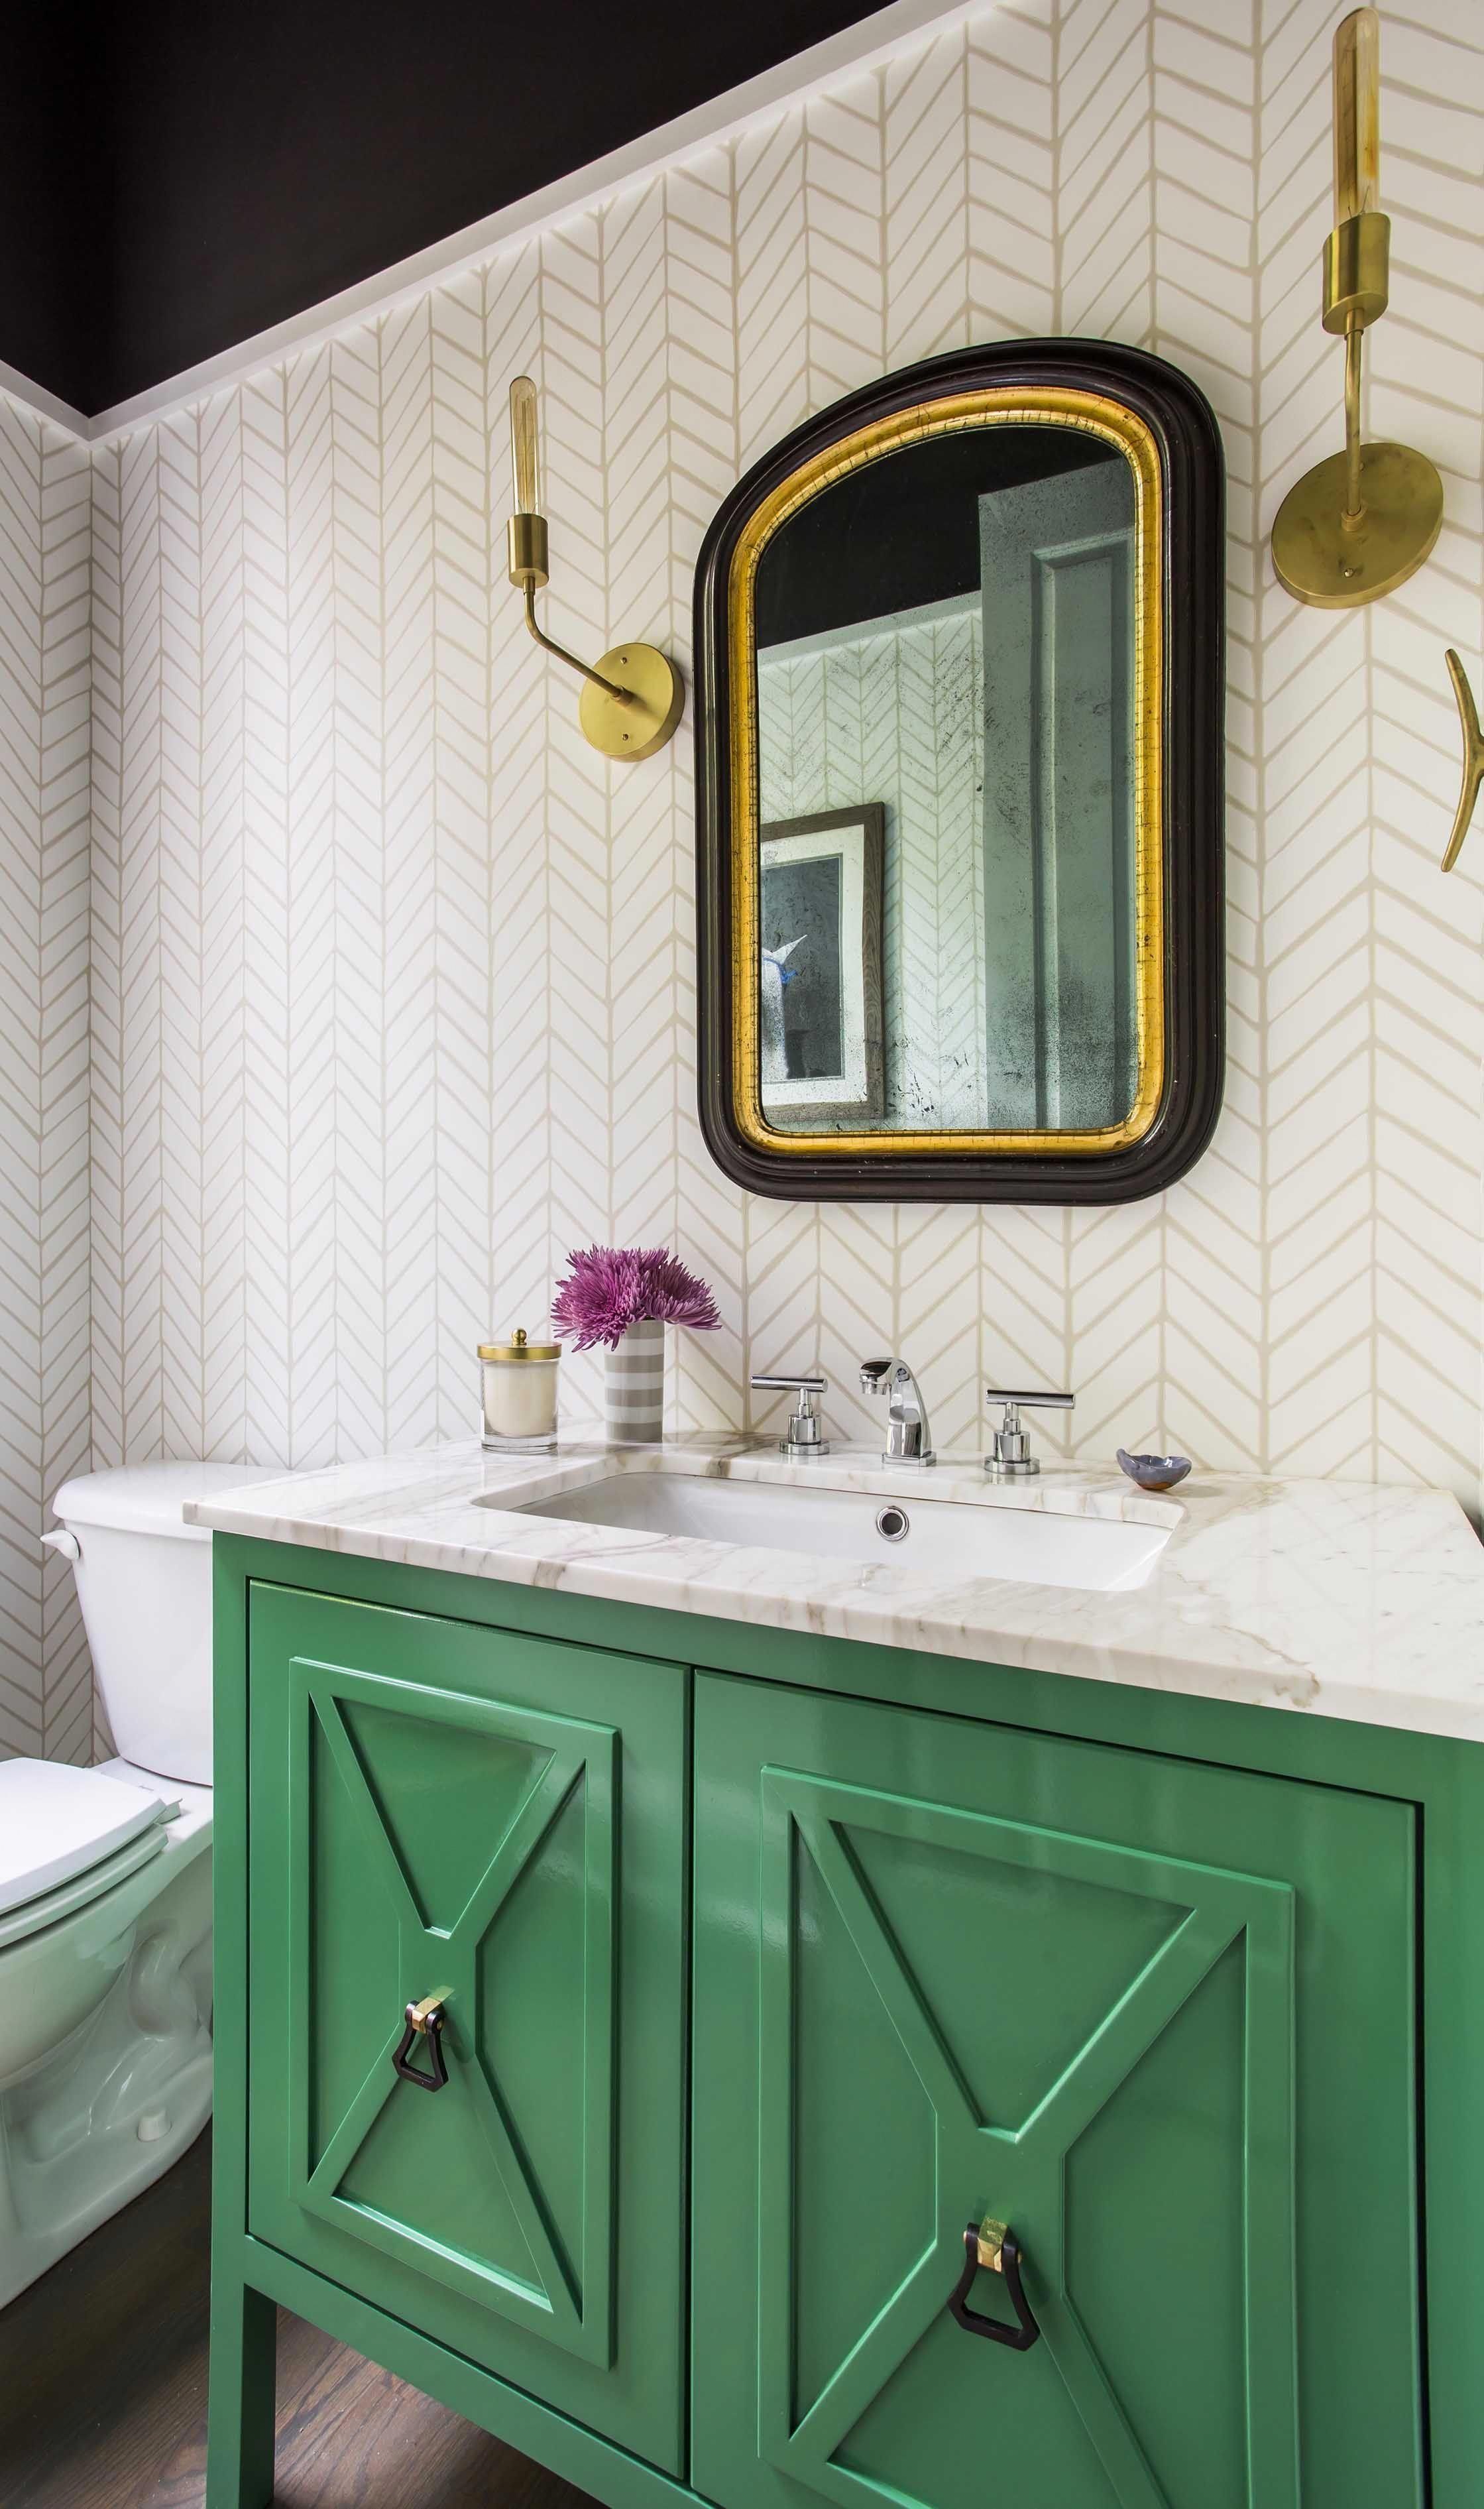 Red Bathroom Accessories Bathroom Towels And Accessories Light Purple Bathroom Accessories 20190 Green Vanity Transitional Bathroom Decor Diy Vanity Mirror